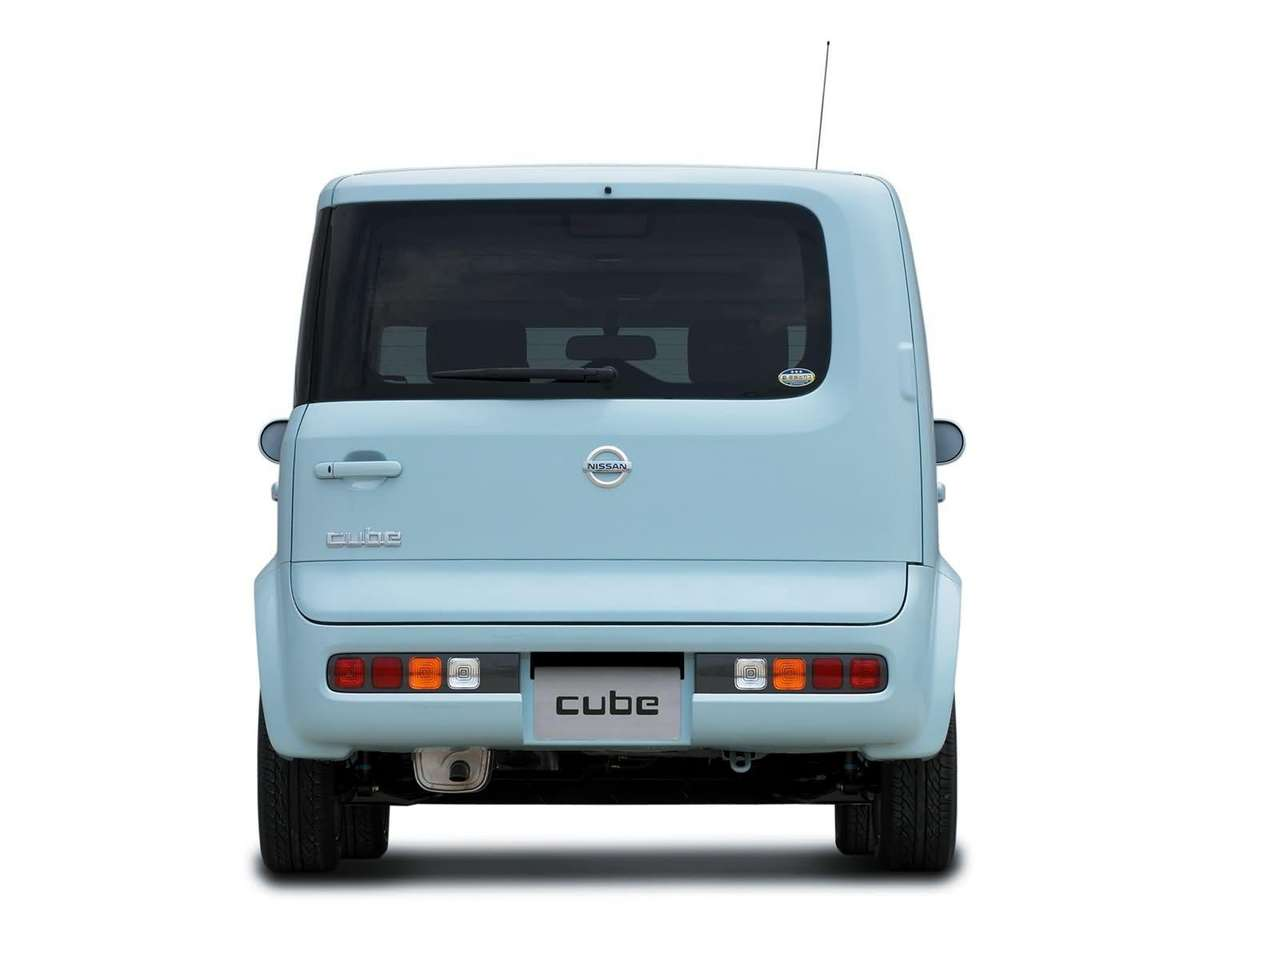 Nissan Cube, Nissan, Cube, Japan, Japanese car, hatchback, family car, odd car, weird car, strange car, automotive, car, cars, retro car, classic car, cheap car, bargain car, motoring, ebay, ebay motors, autotrader